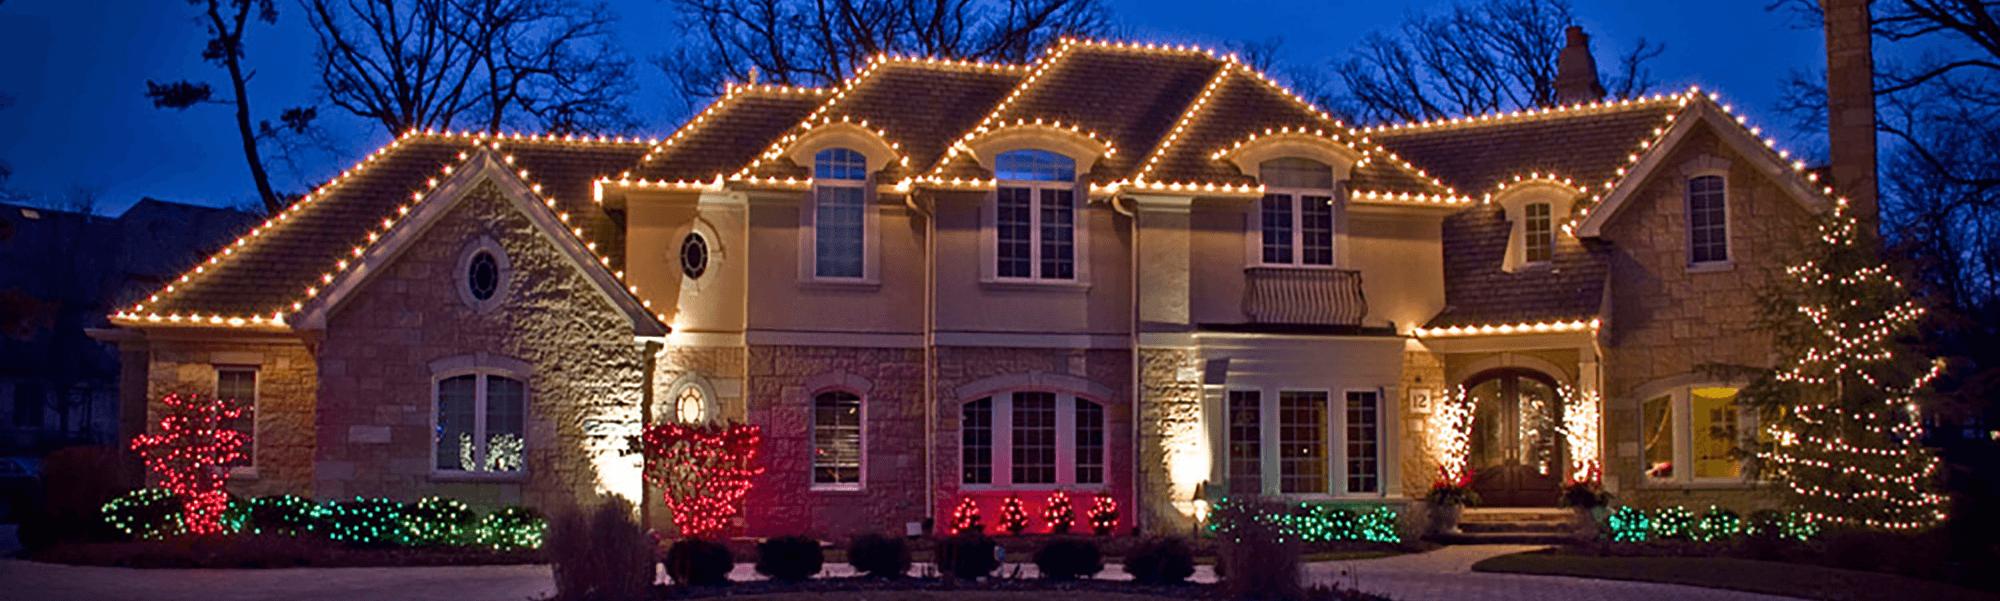 christmas light installer camden nj